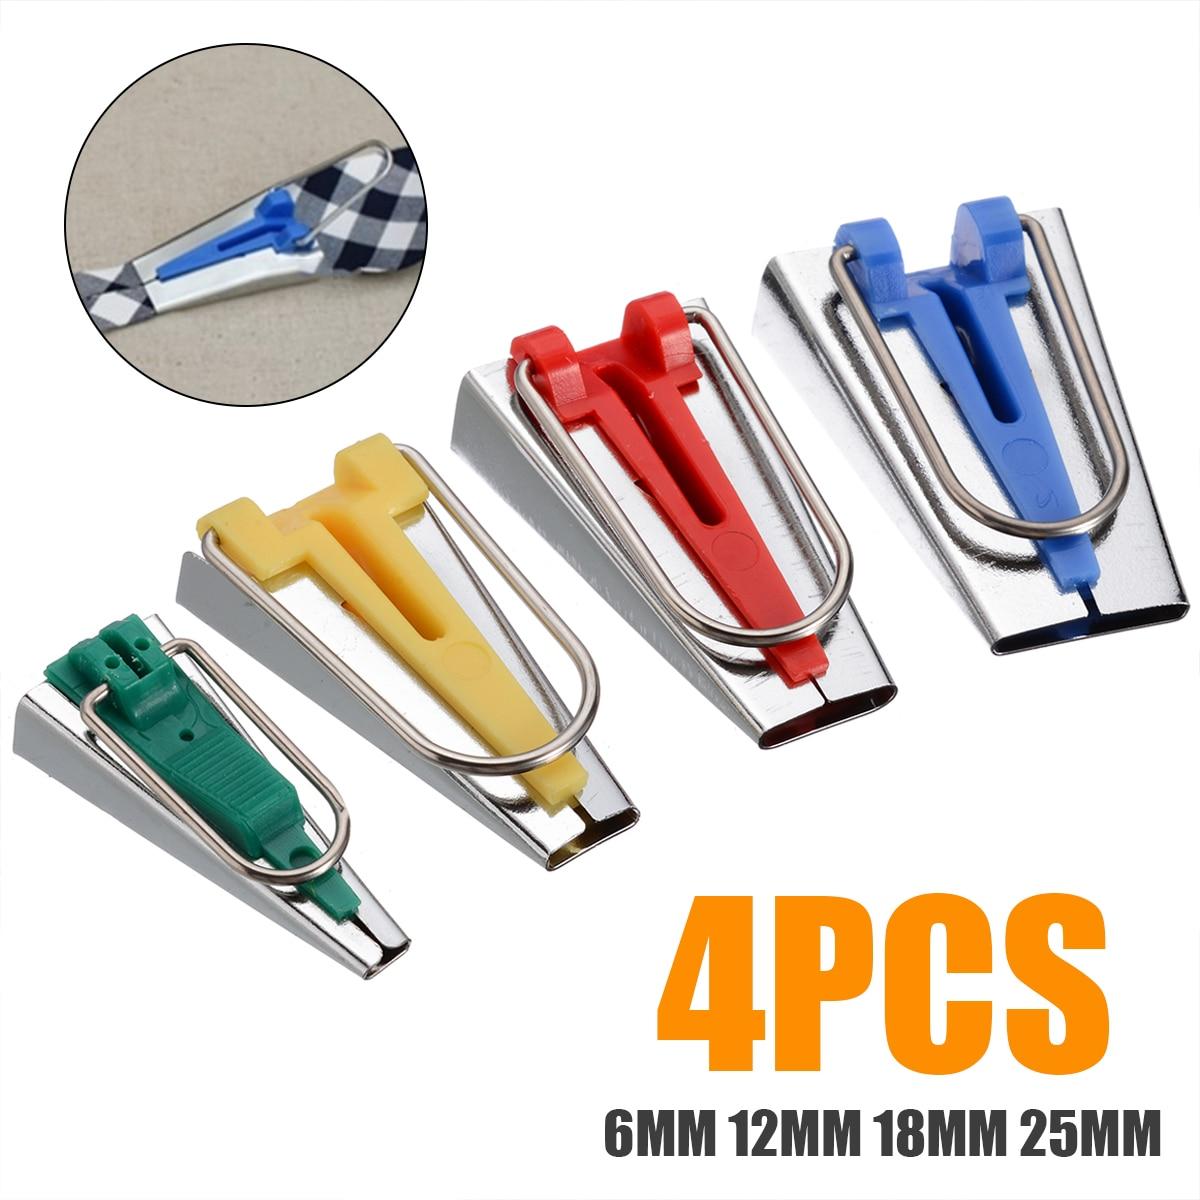 4 pçs/set 6mm 12mm 18mm 25mm 4 tamanhos de fita de viés fabricante ferramenta estofando emperramento tapeçadores conjunto para costura